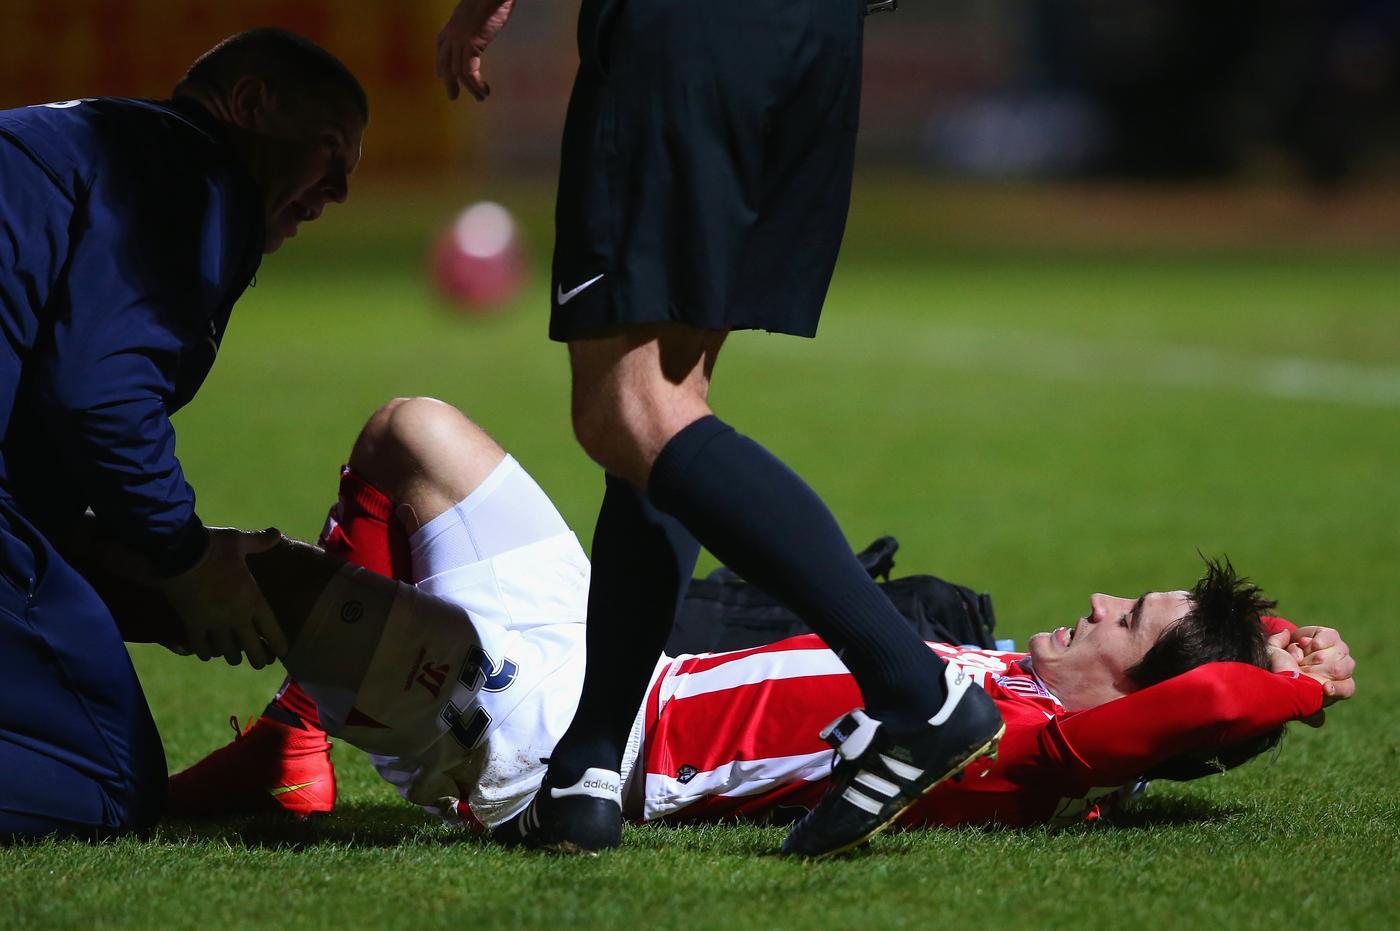 Stoke's injury crisis will define Mark Hughes' managerial credentials as Aston Villa await